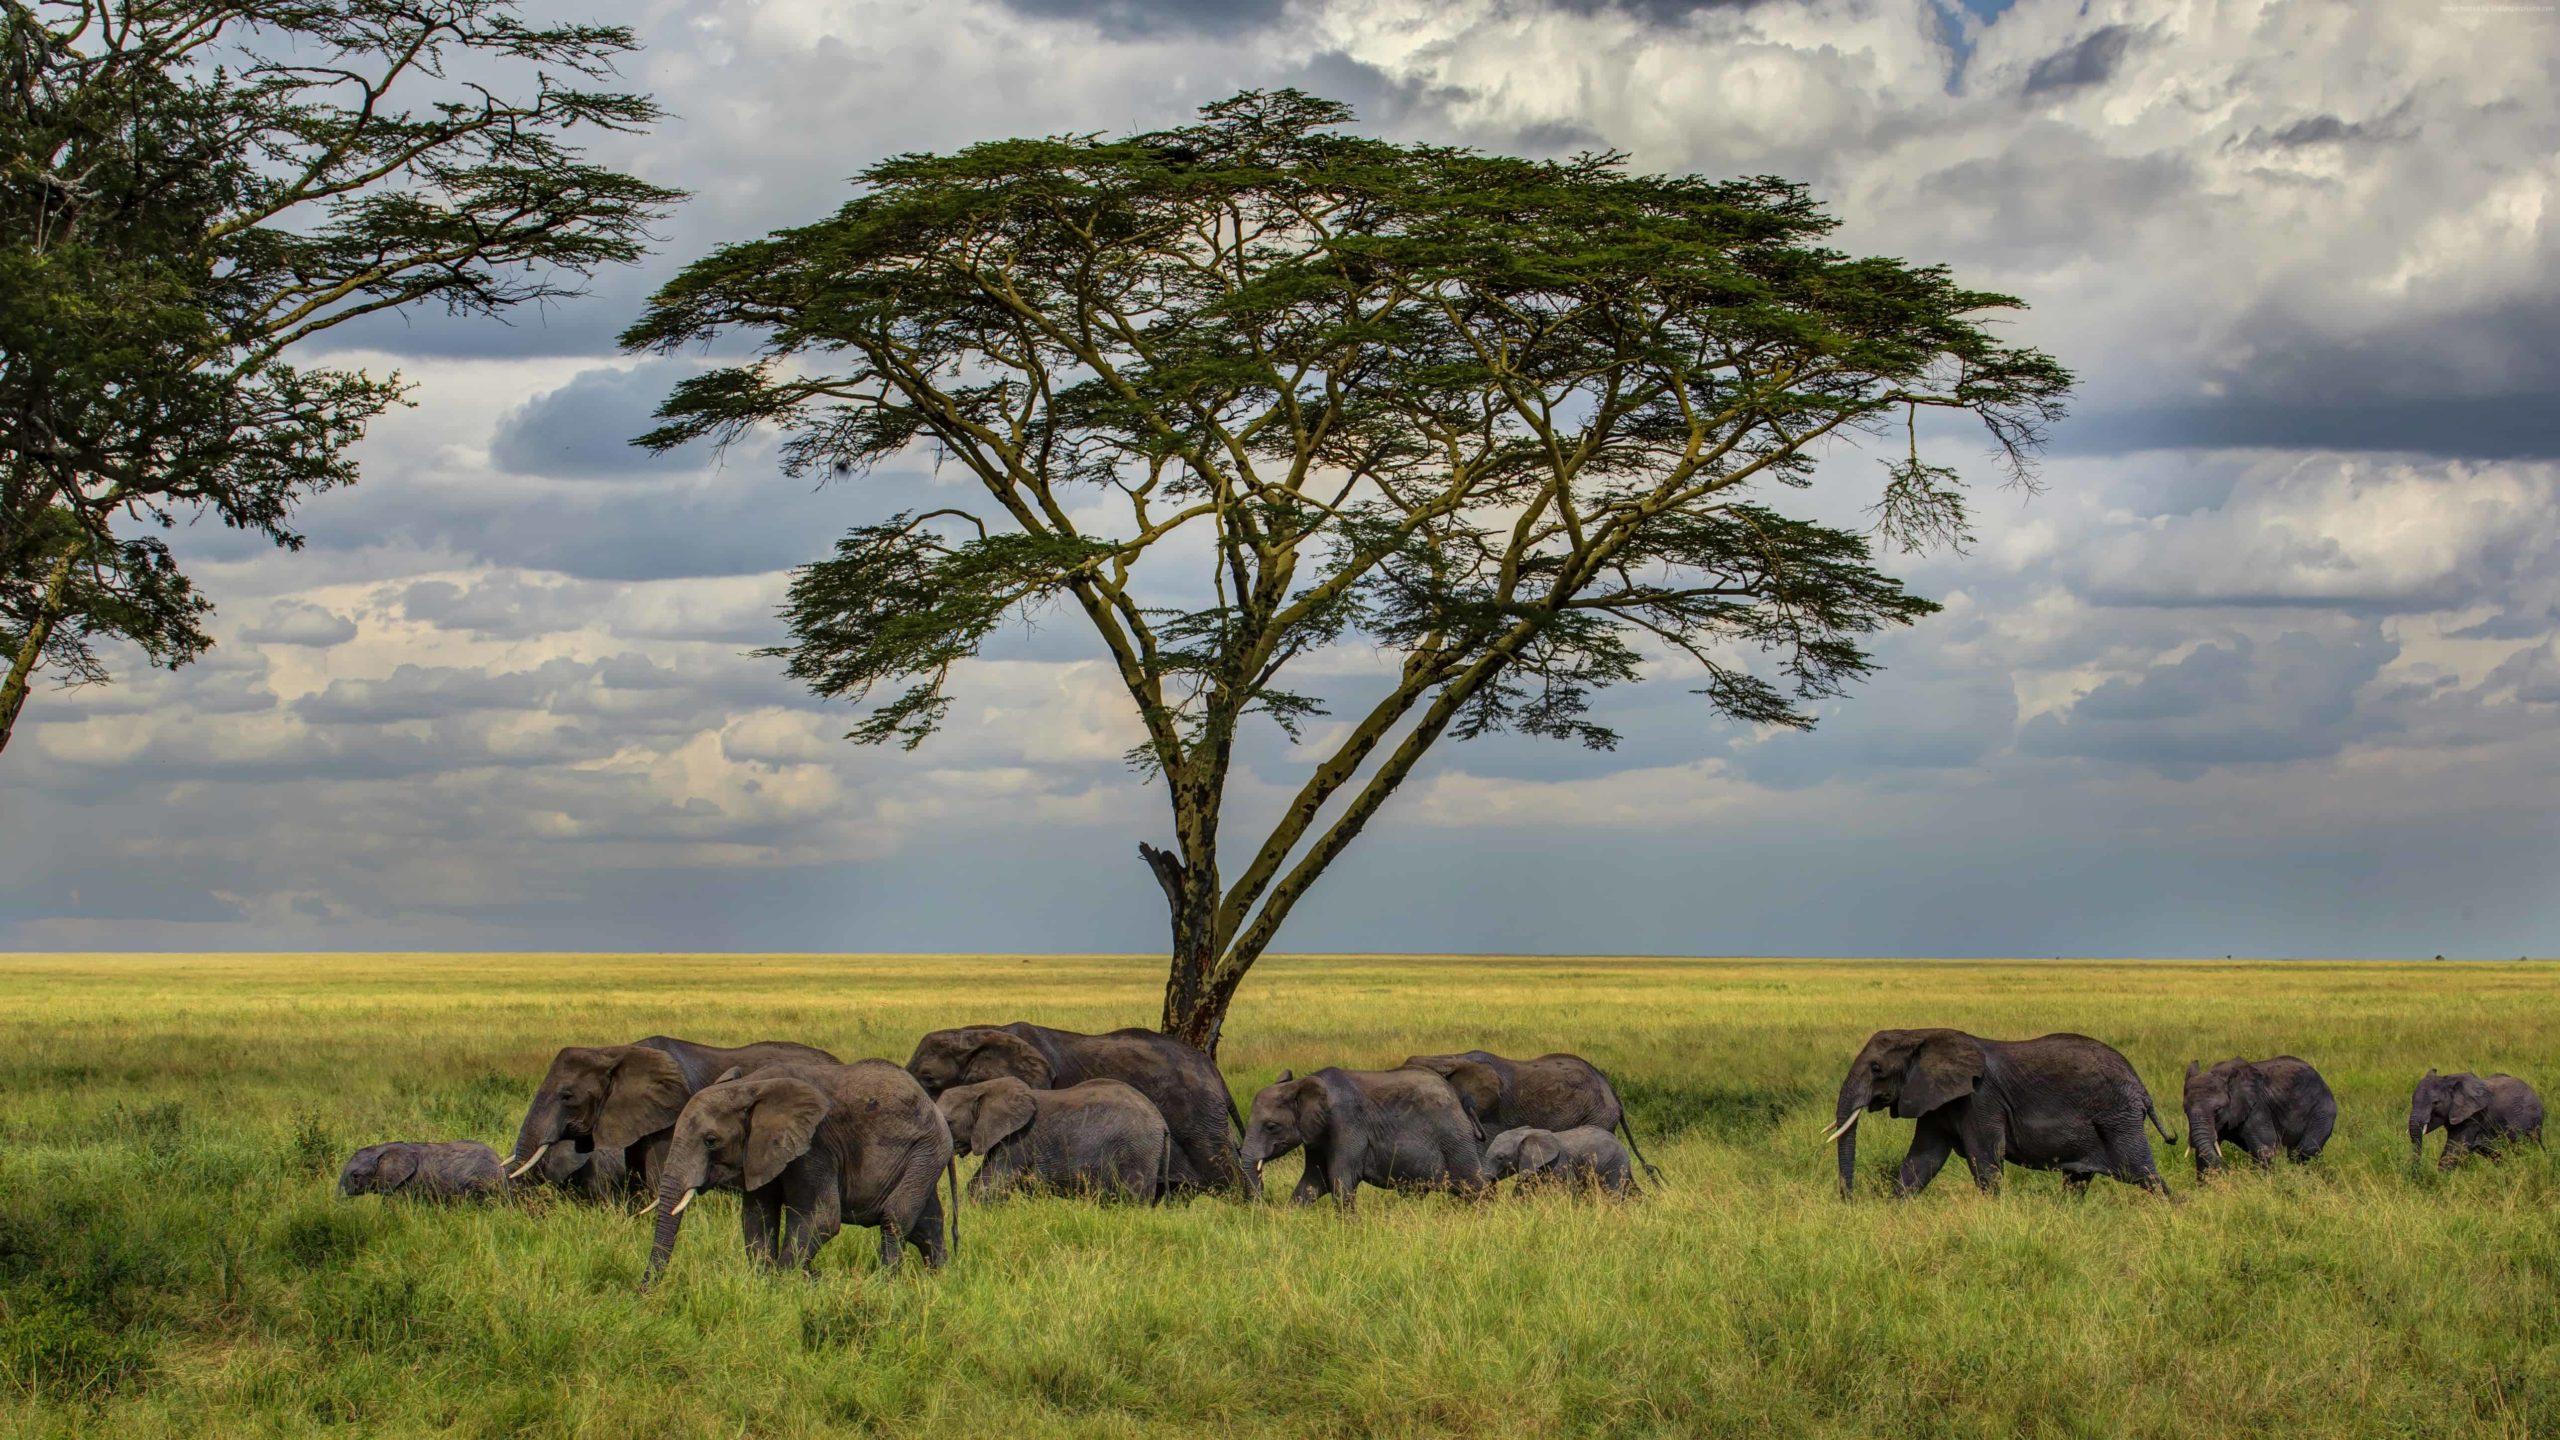 elephant wallpaper hd 1080p